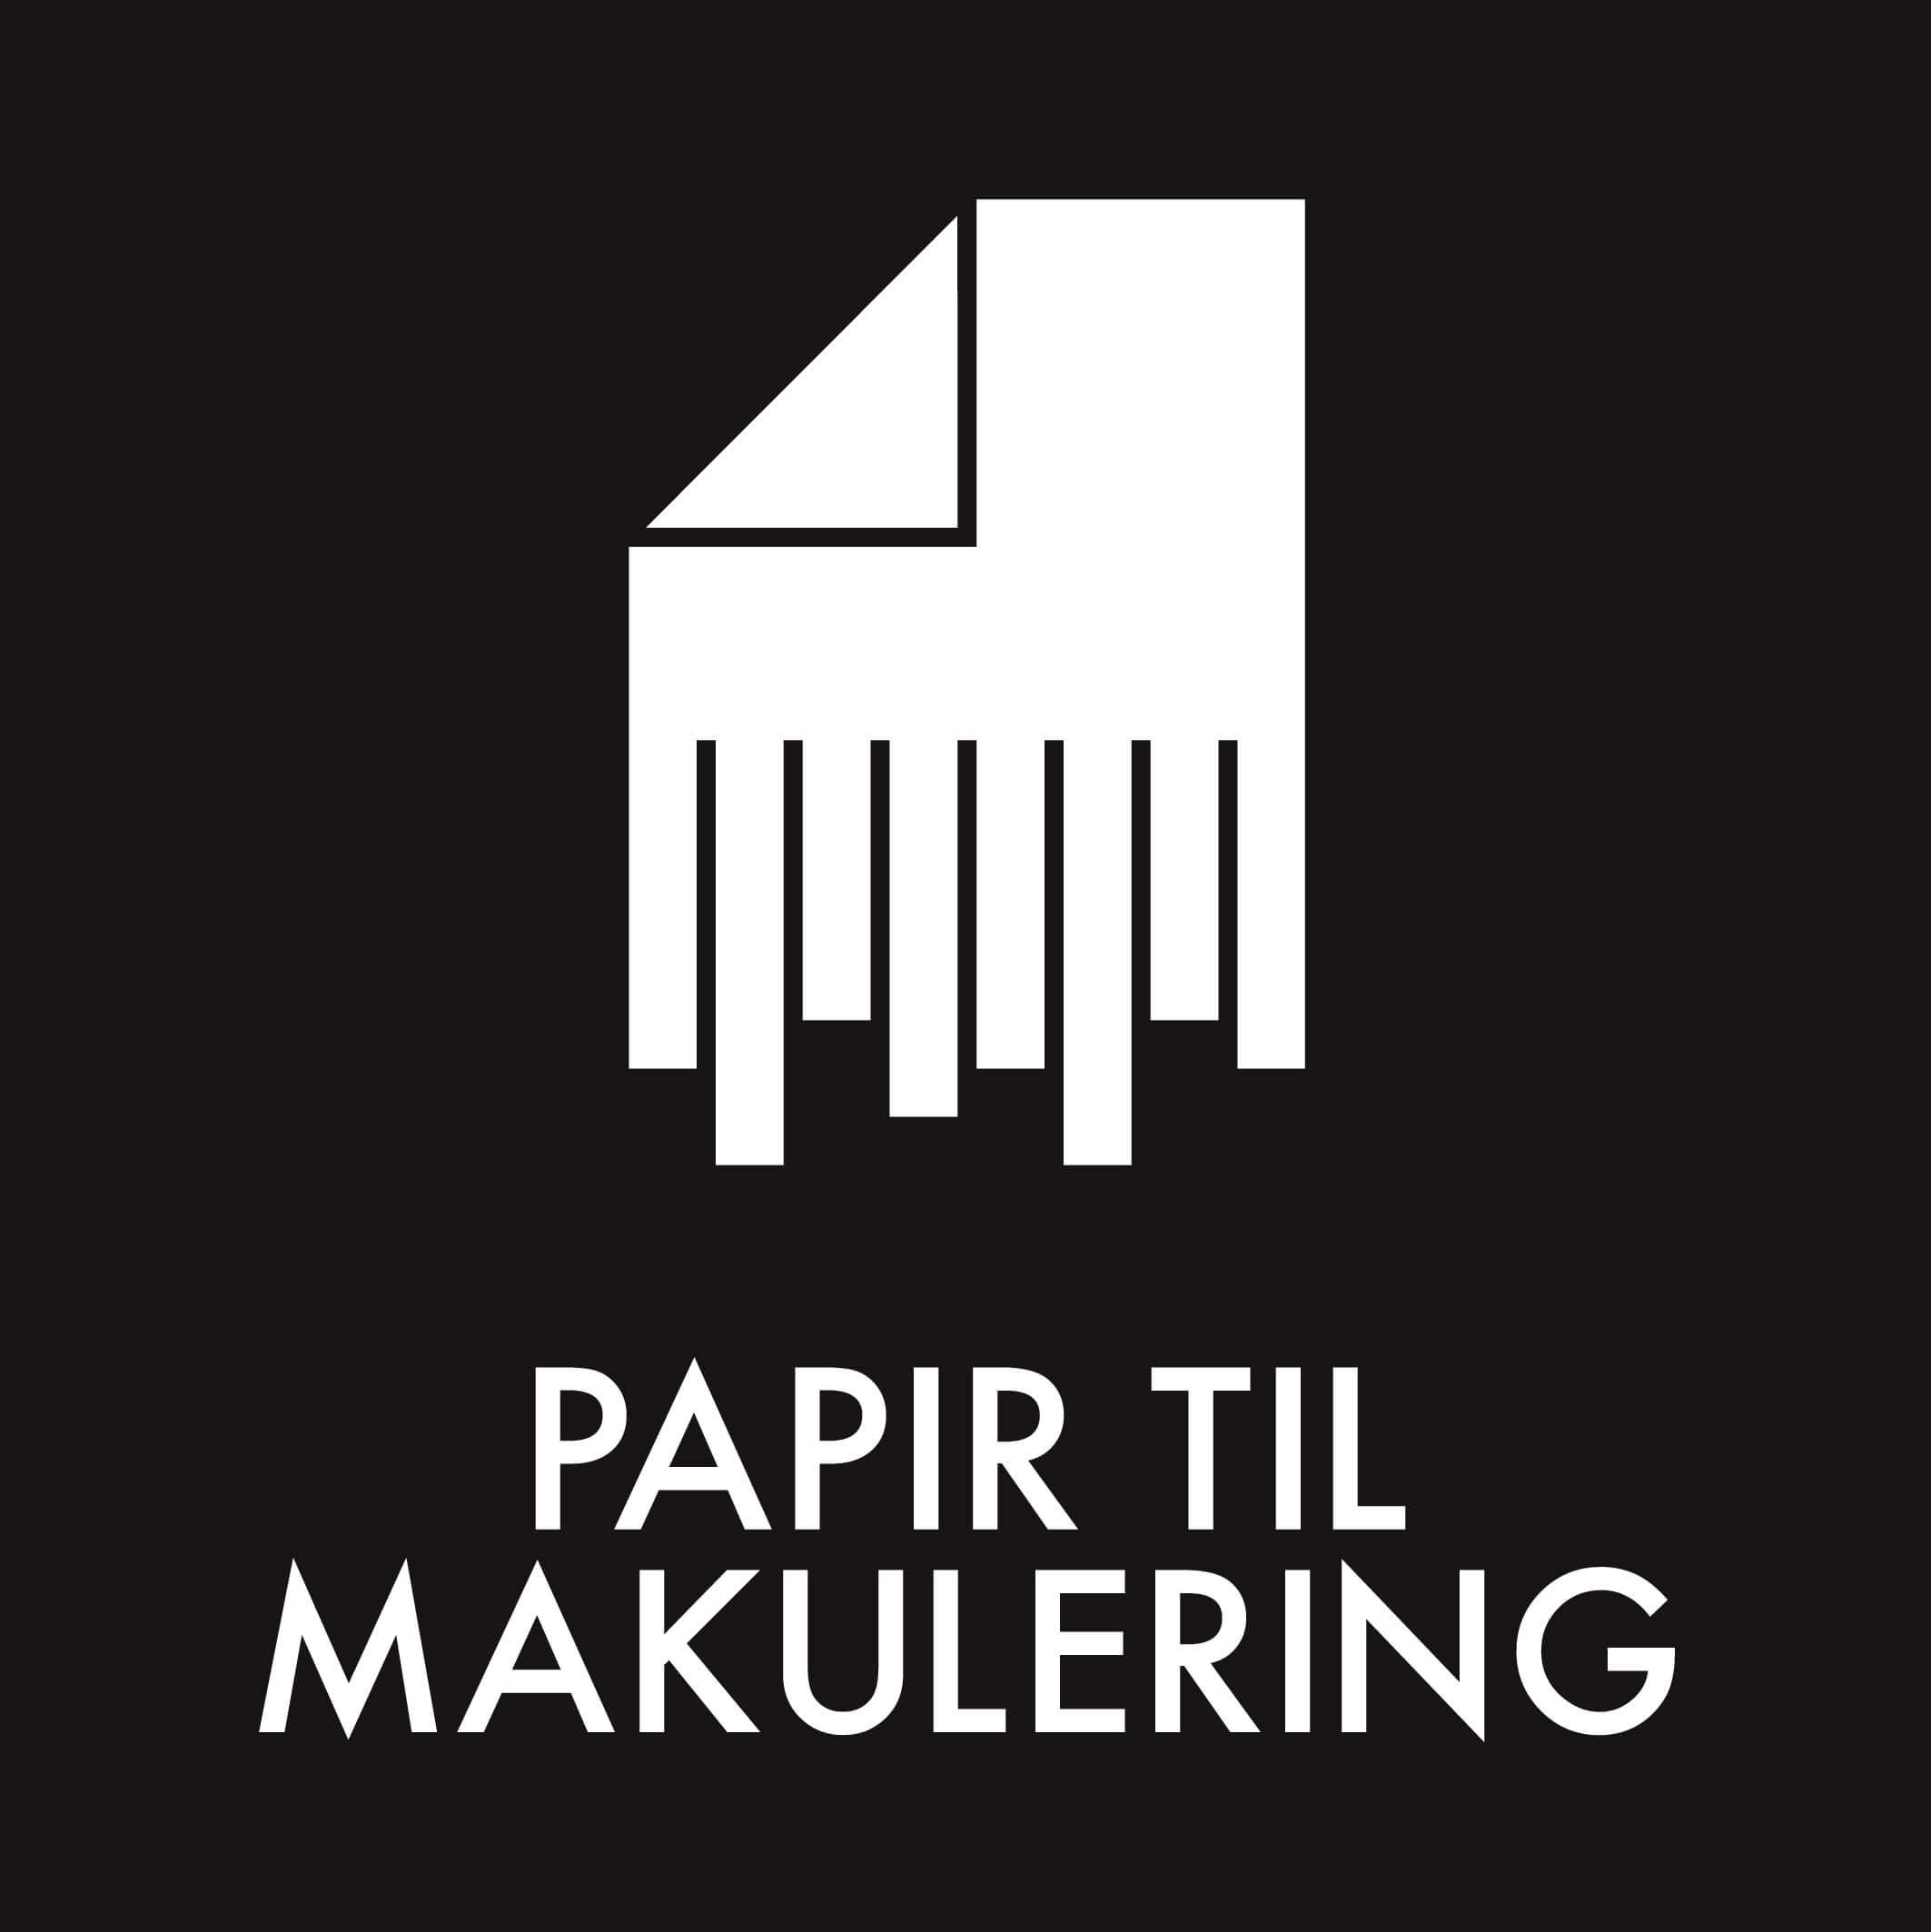 Dansk Affaldssortering - Papir til makulering sort